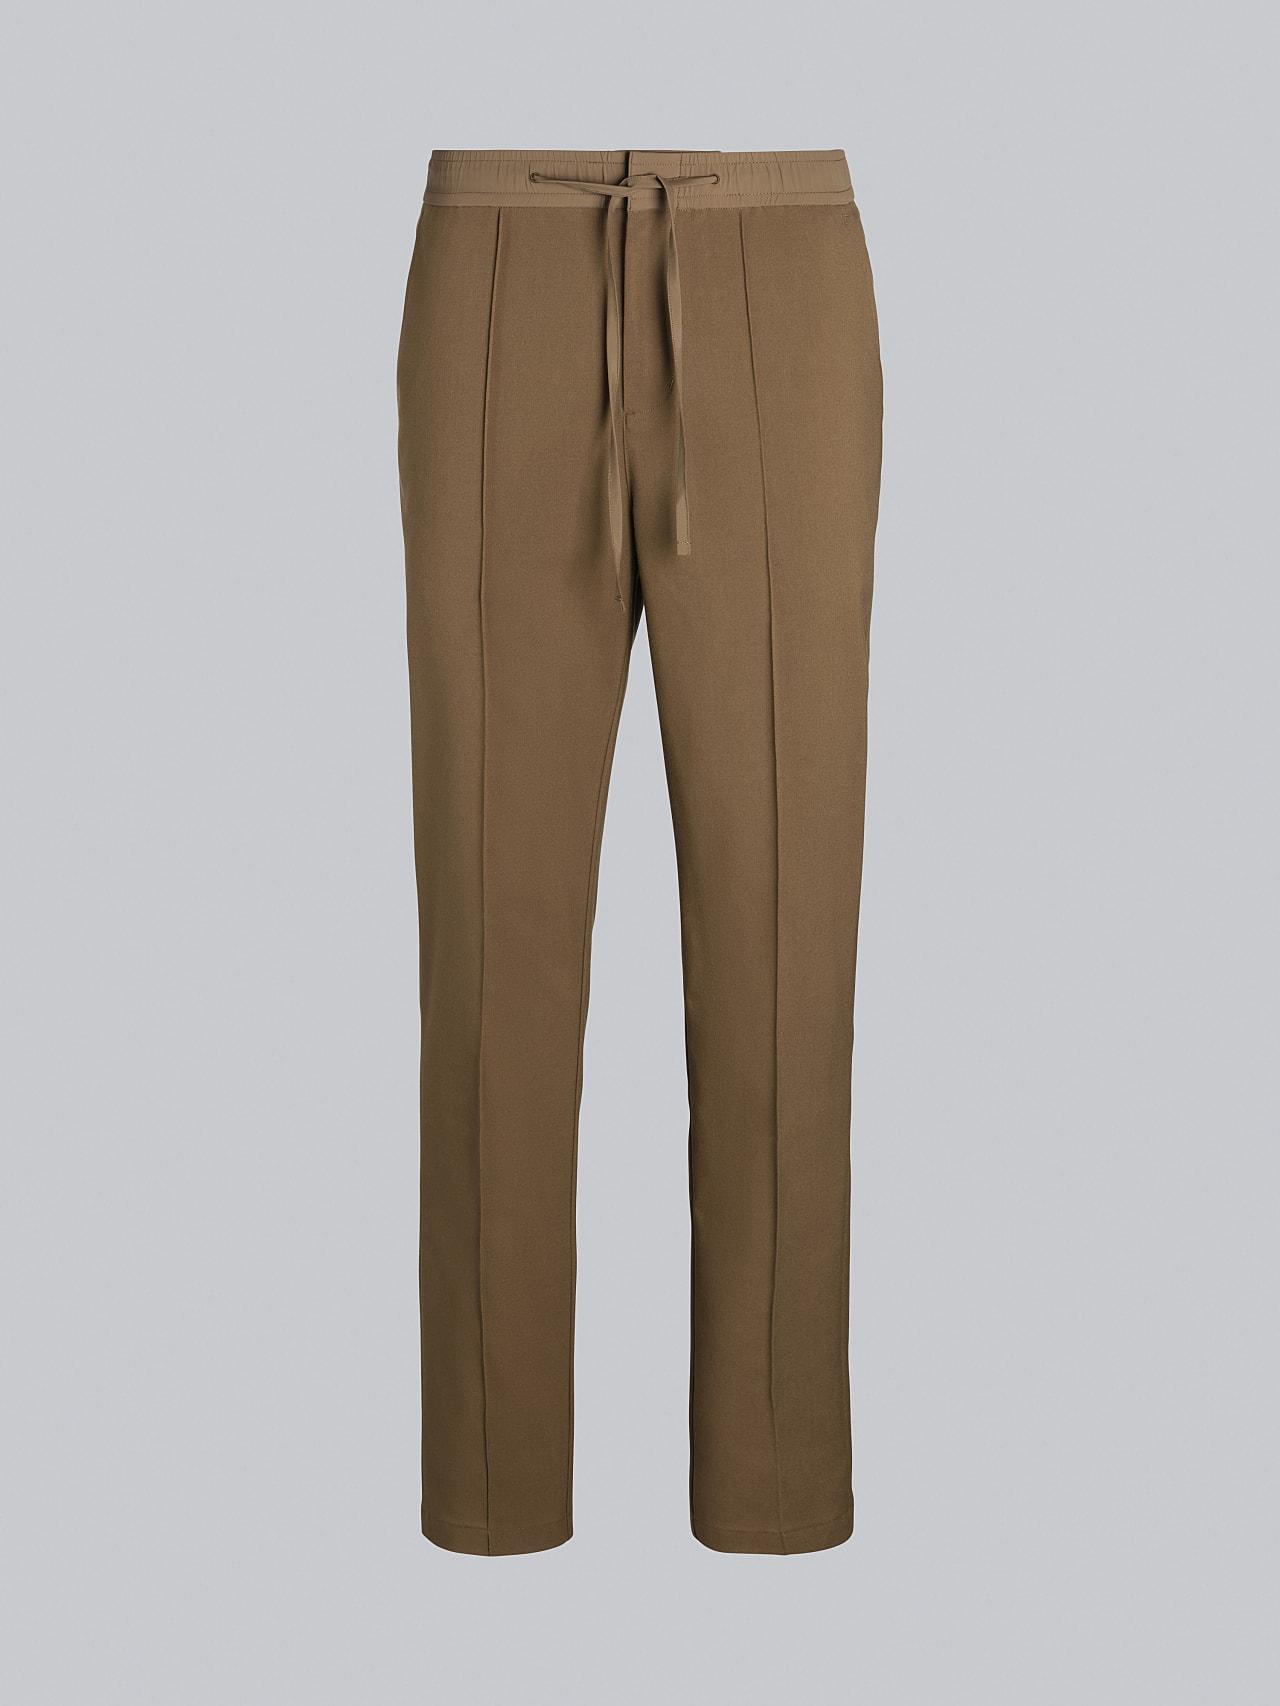 PANZA V1.Y5.02 Slim Pleat Trousers gold Back Alpha Tauri